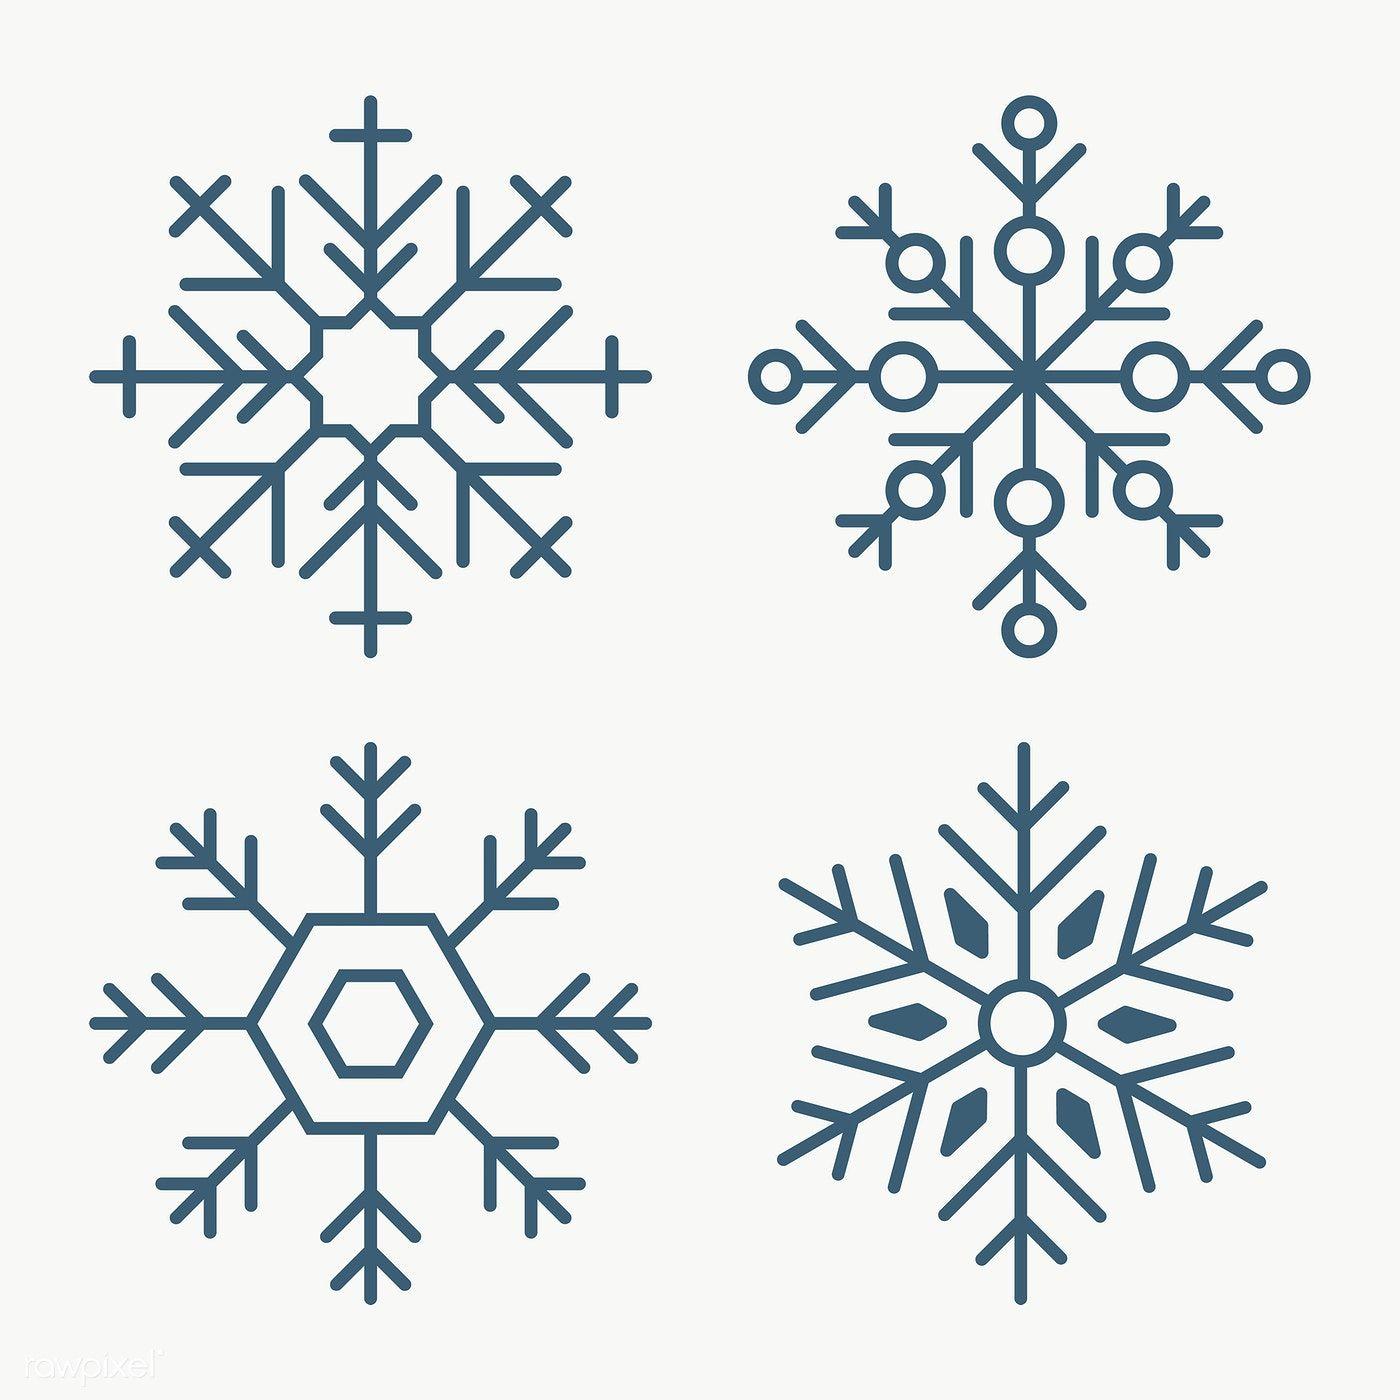 Christmas Snowflake Social Ads Template Set Transparent Png Premium Image By Rawpixel Com Sasi Christmas Snowflakes Snowflake Template Snowflakes